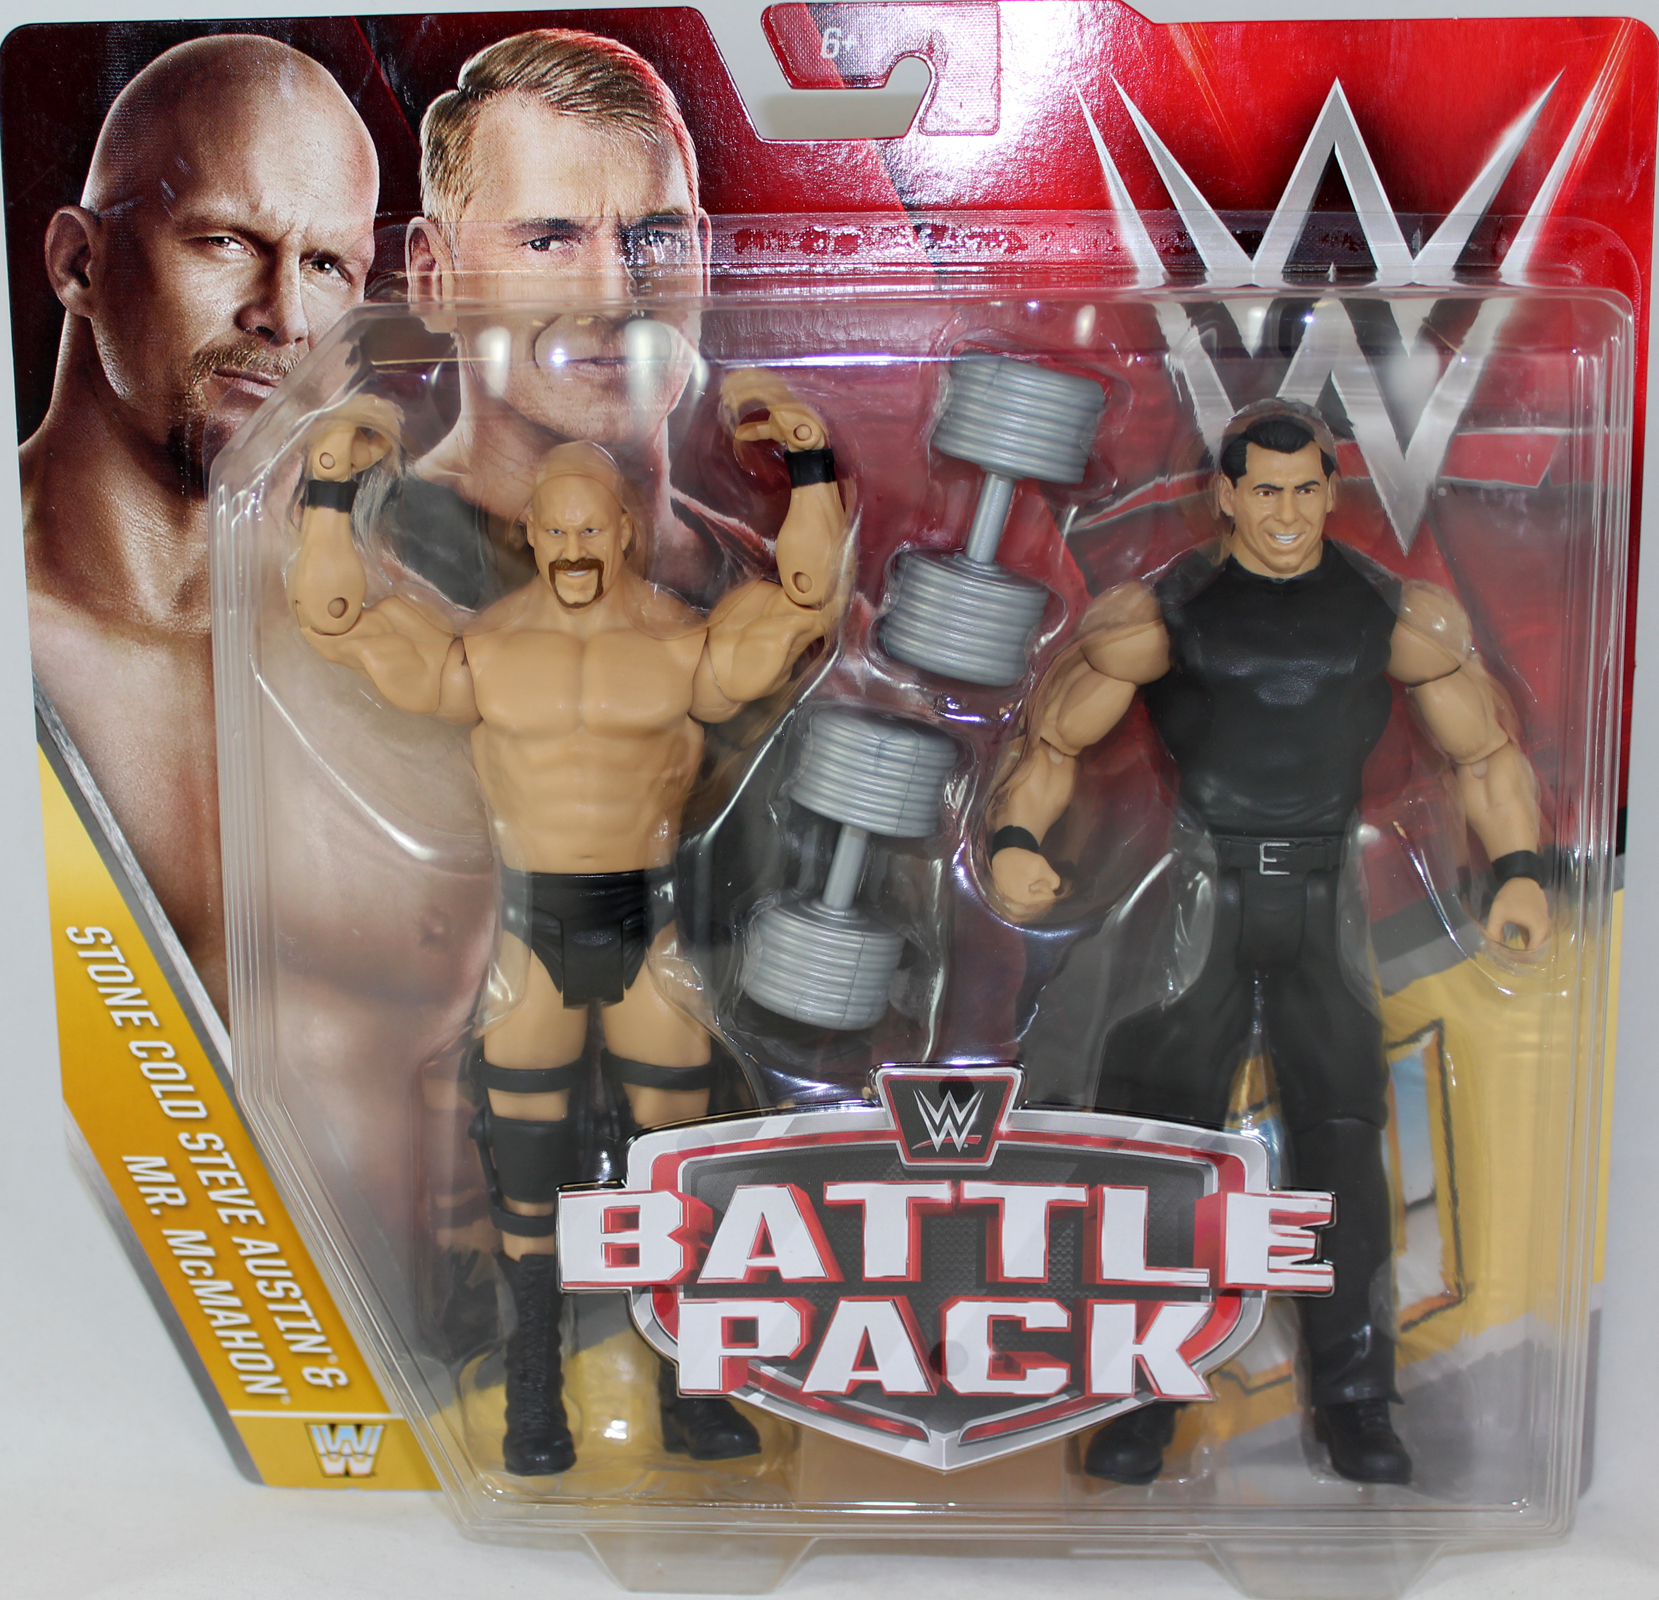 Stone Cold Steve Austin & Mr. McMahon (Vince McMahon) - WWE Battle Packs 40 WWE Toy Wrestling Action Figures